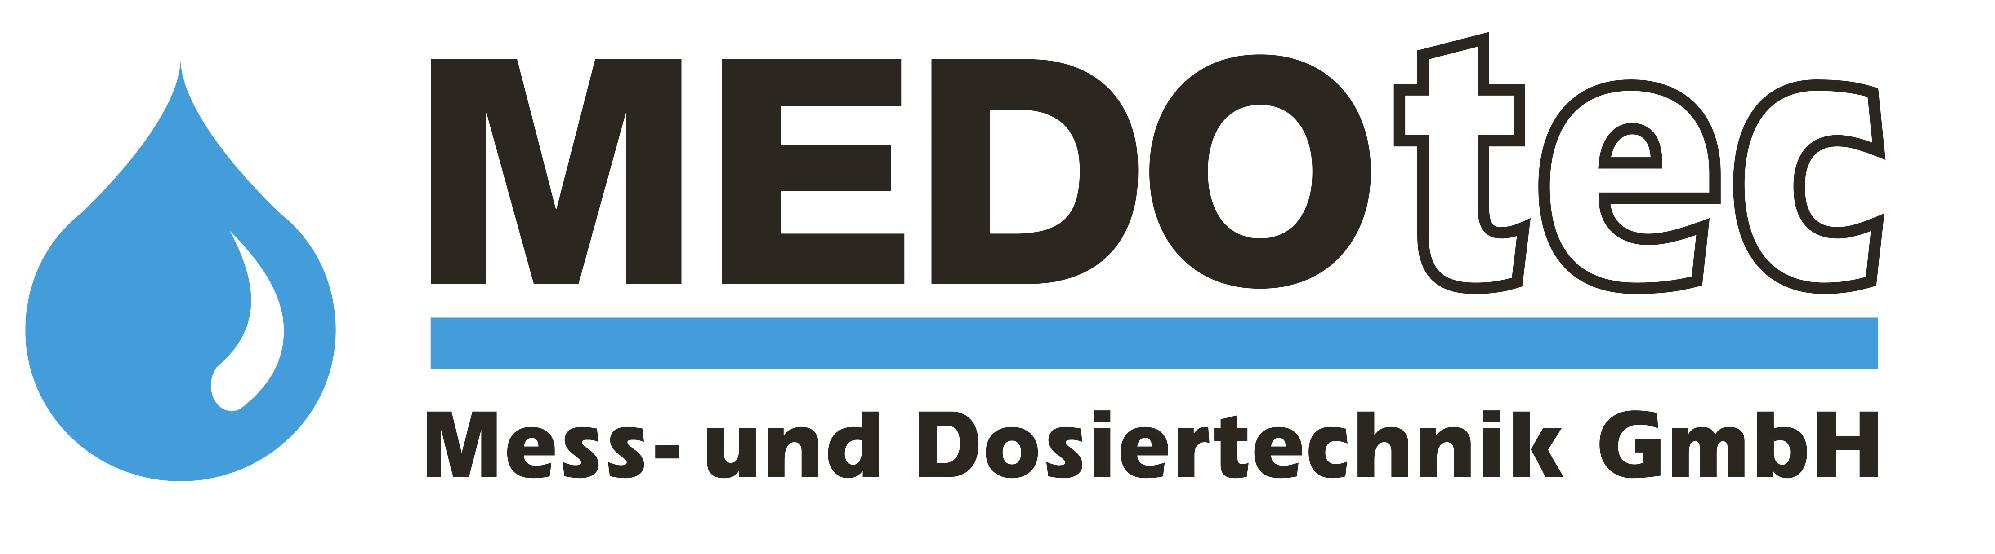 Company banner of MEDOtec GmbH